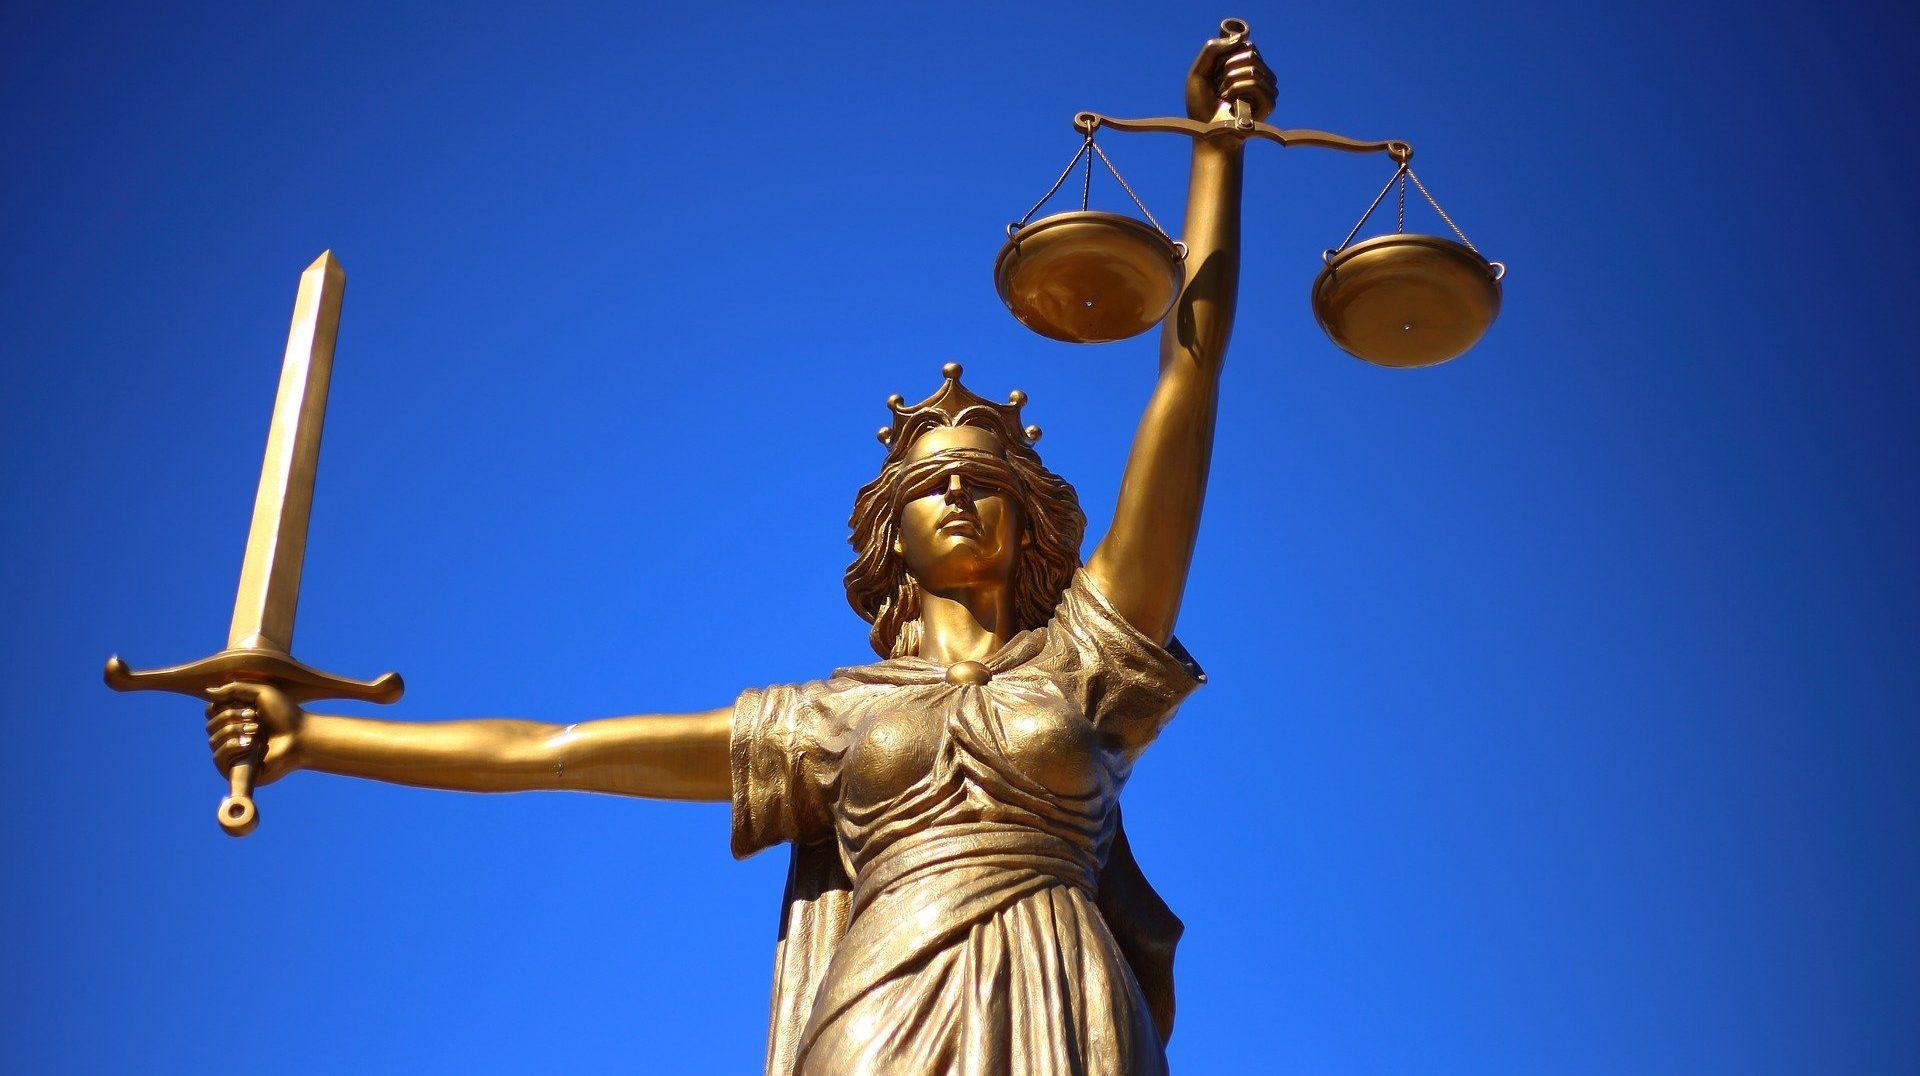 McIlwain Law